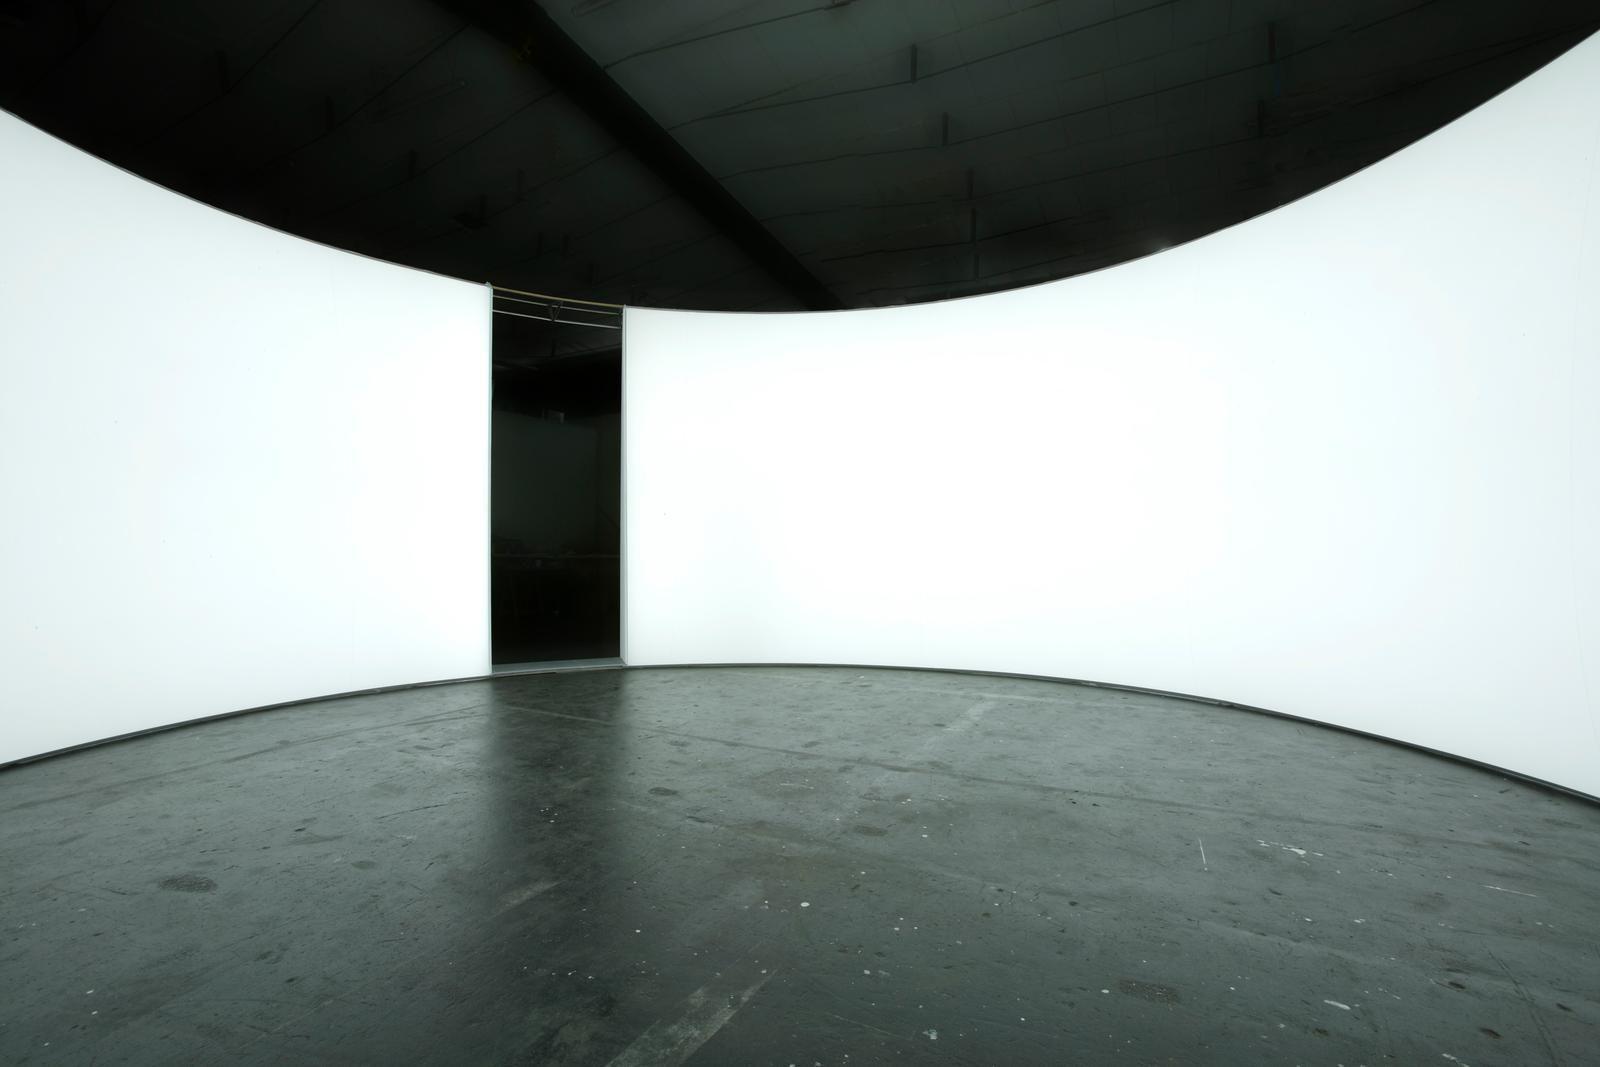 360° white room • Artwork • Studio Olafur Eliasson